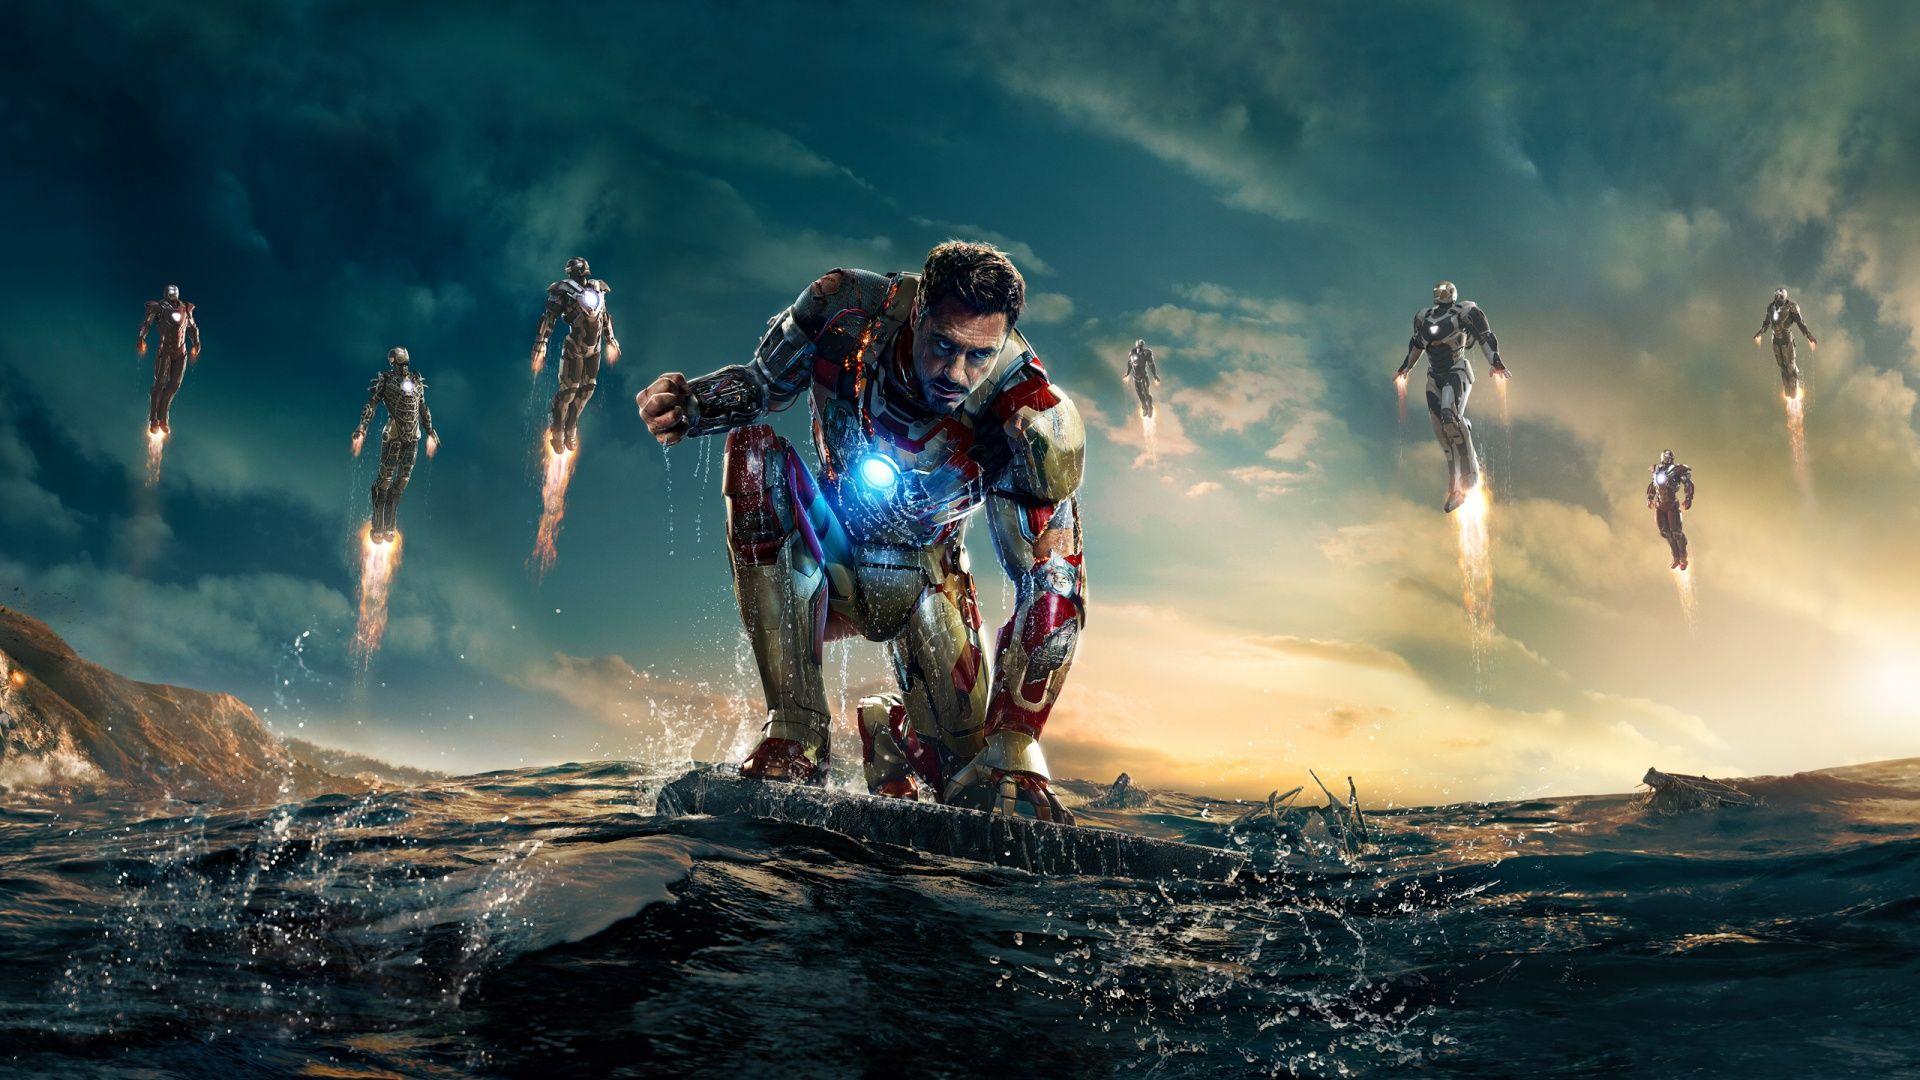 Iron Man 3 1920 X 1080px Iron Man Wallpaper Iron Man Hd Wallpaper Iron Man